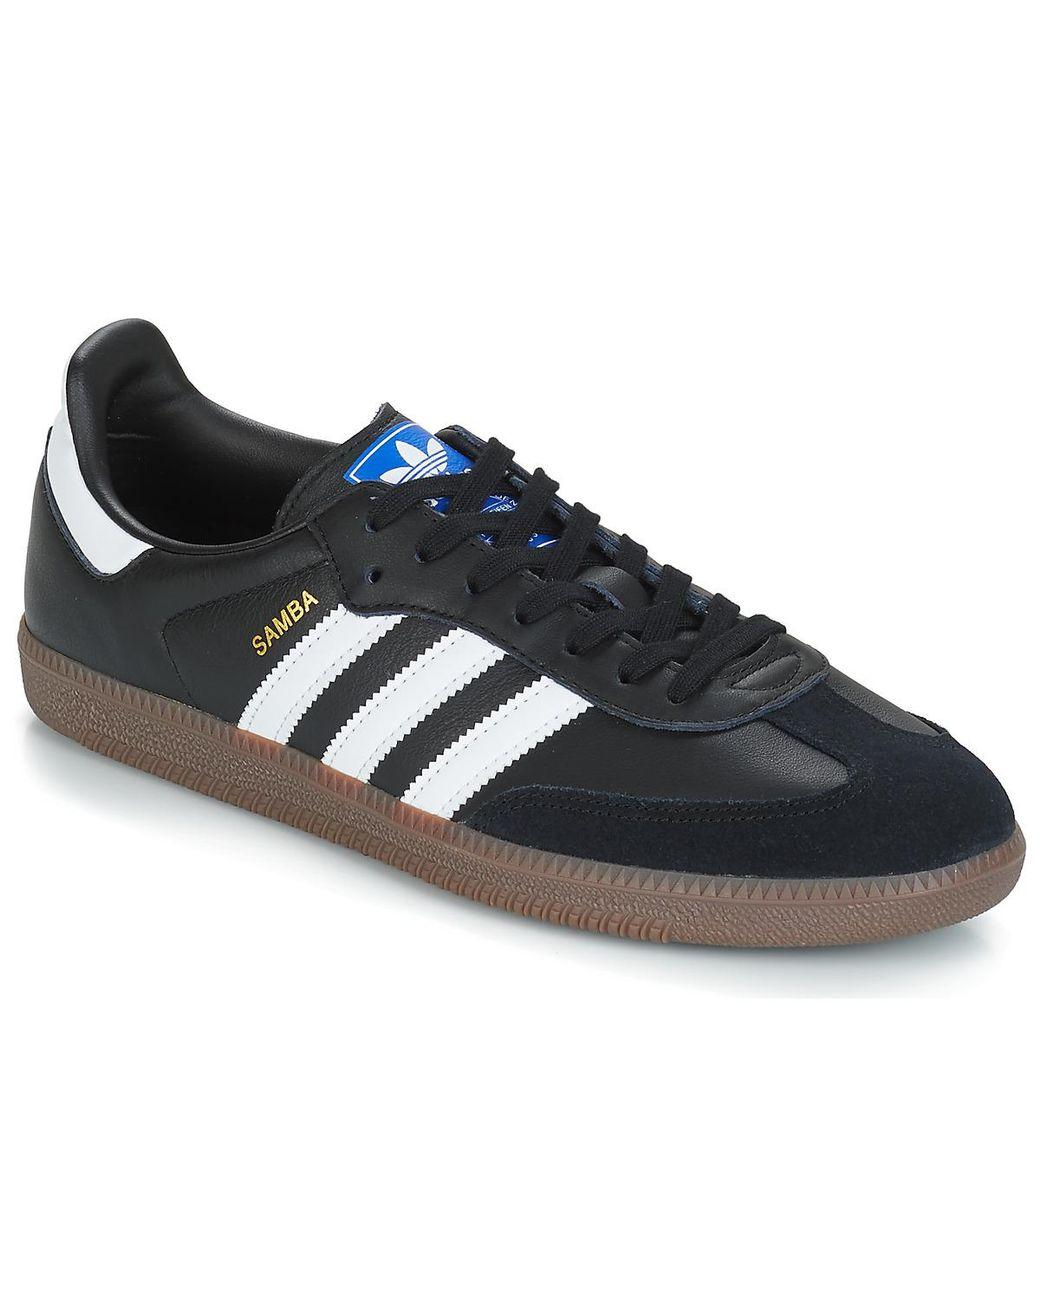 26b92c0a688 Samba Og Women's Shoes (trainers) In Black